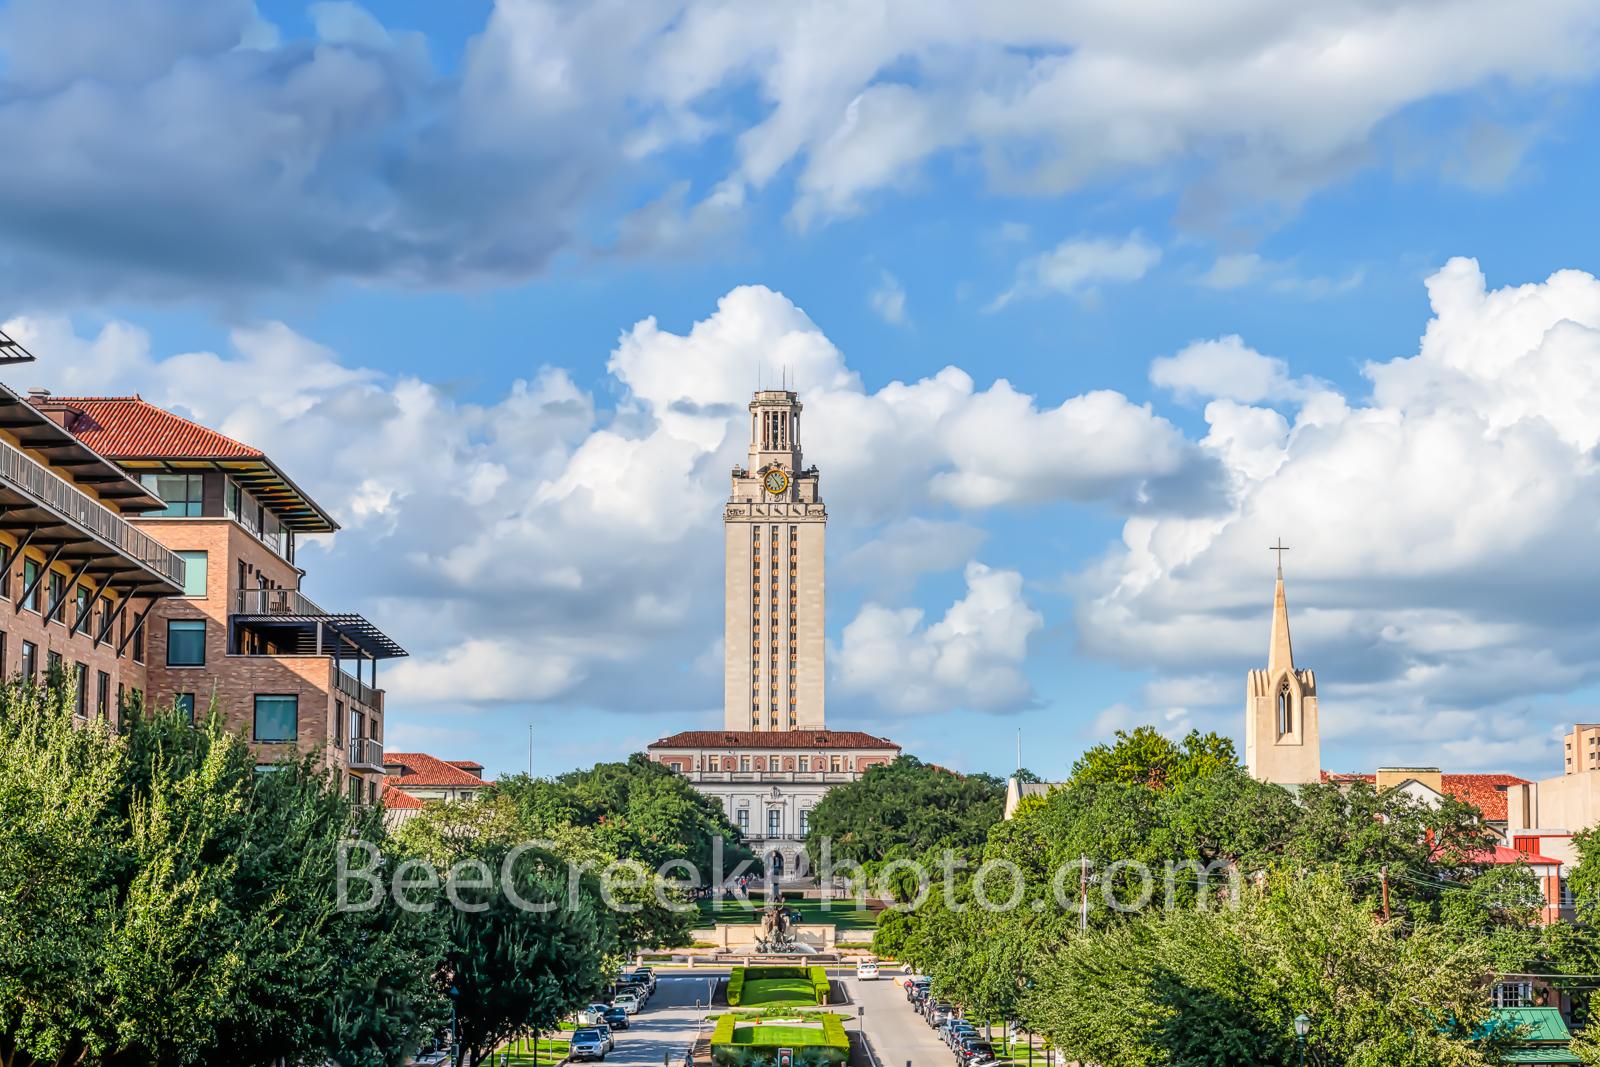 texas, ut, tower, ut tower, ut campus, austin texas, university,  university of texas,  tower, austin downtown, campus, tower shooting, city of austin, city, cities, downtown, , schools, landmark,  te, photo